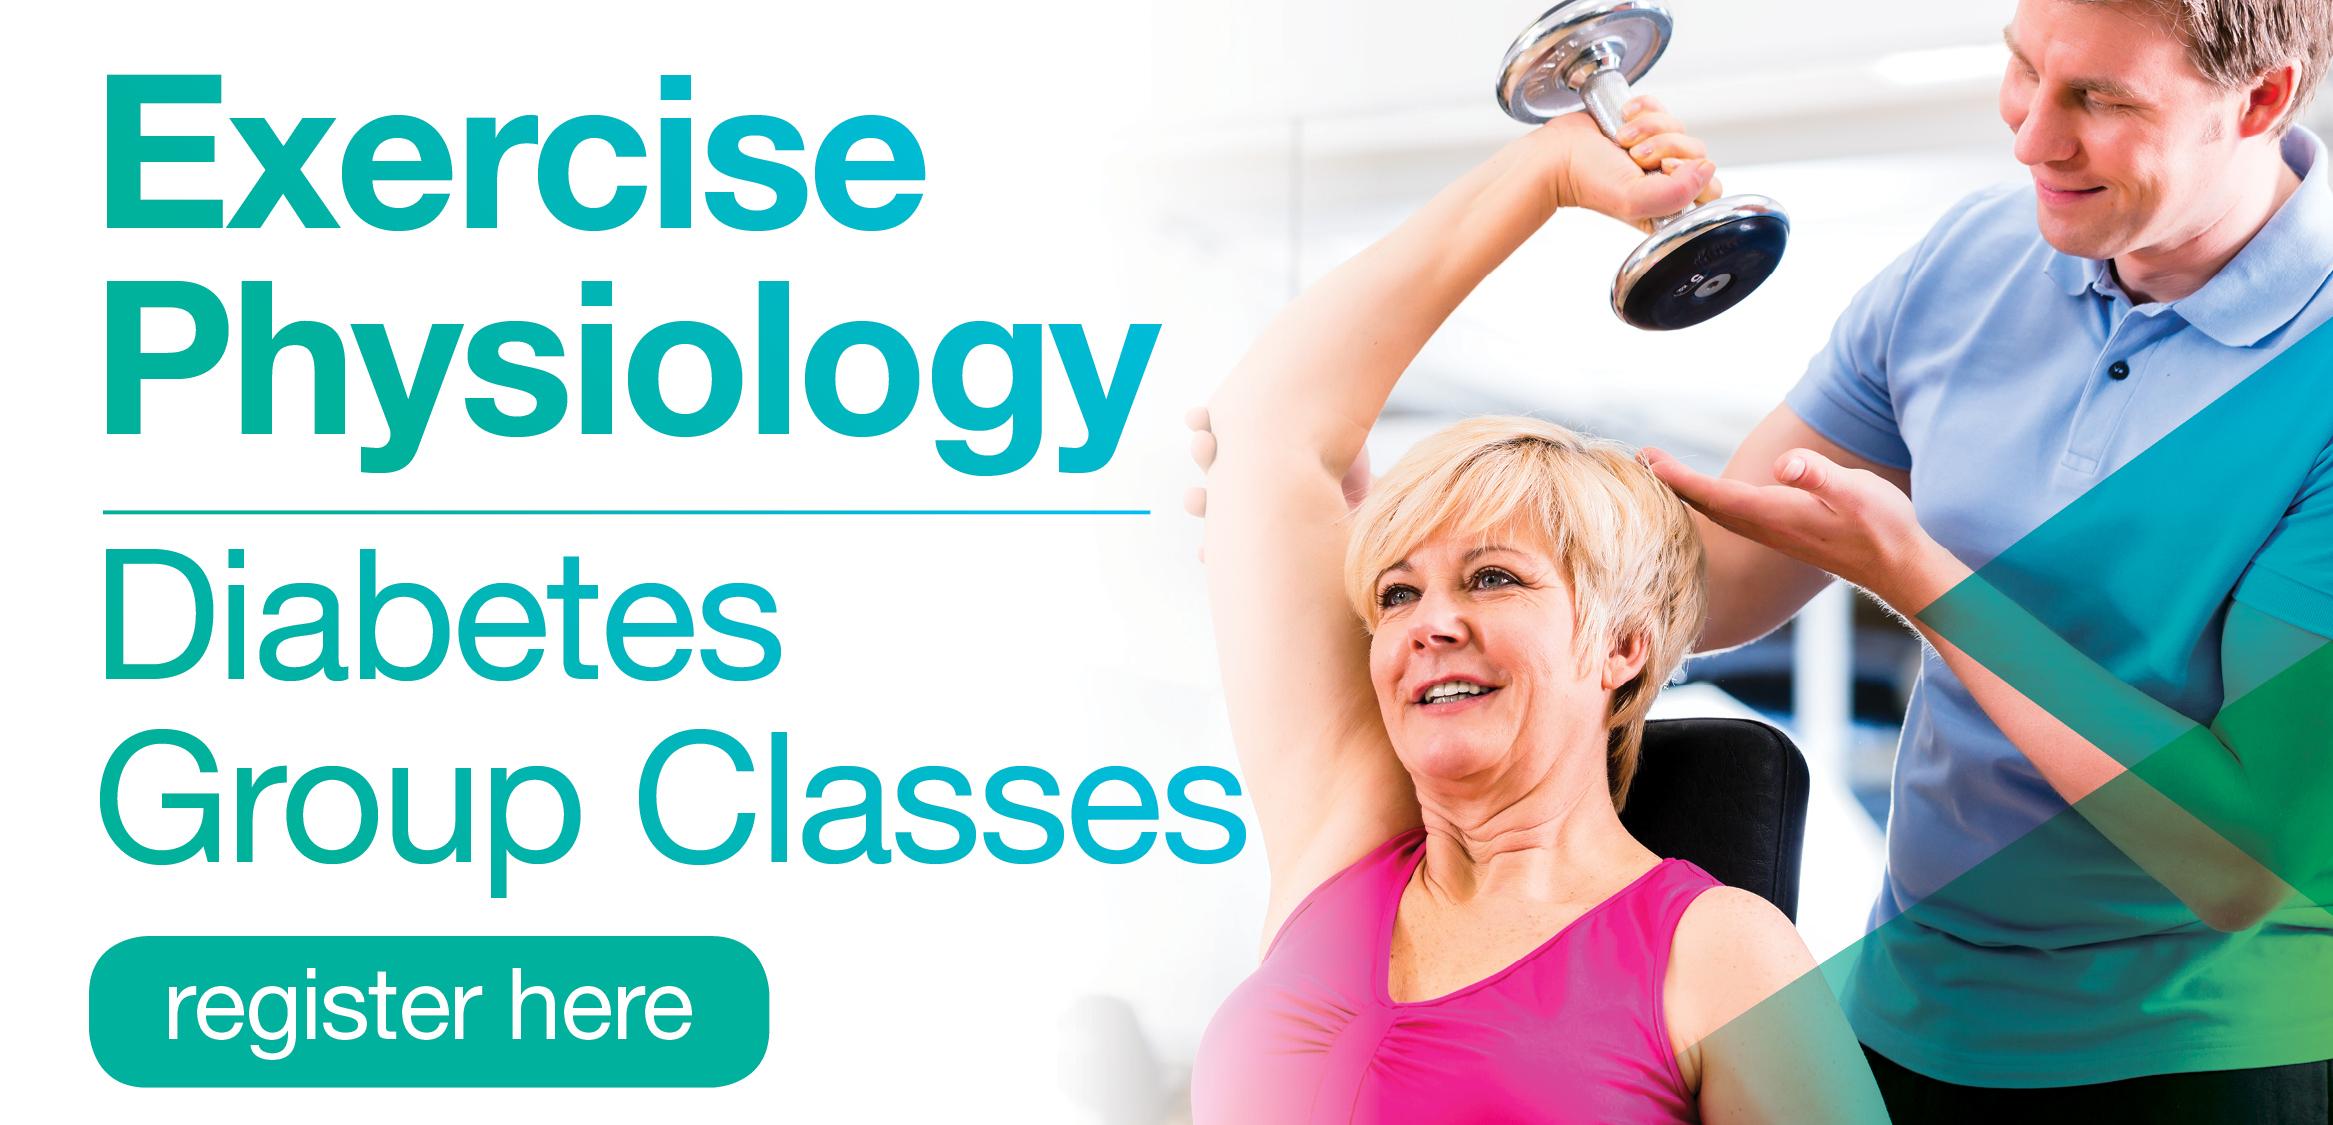 Marion_Exercise-Physiology-Diabetes-Register-Link.jpg#asset:13860